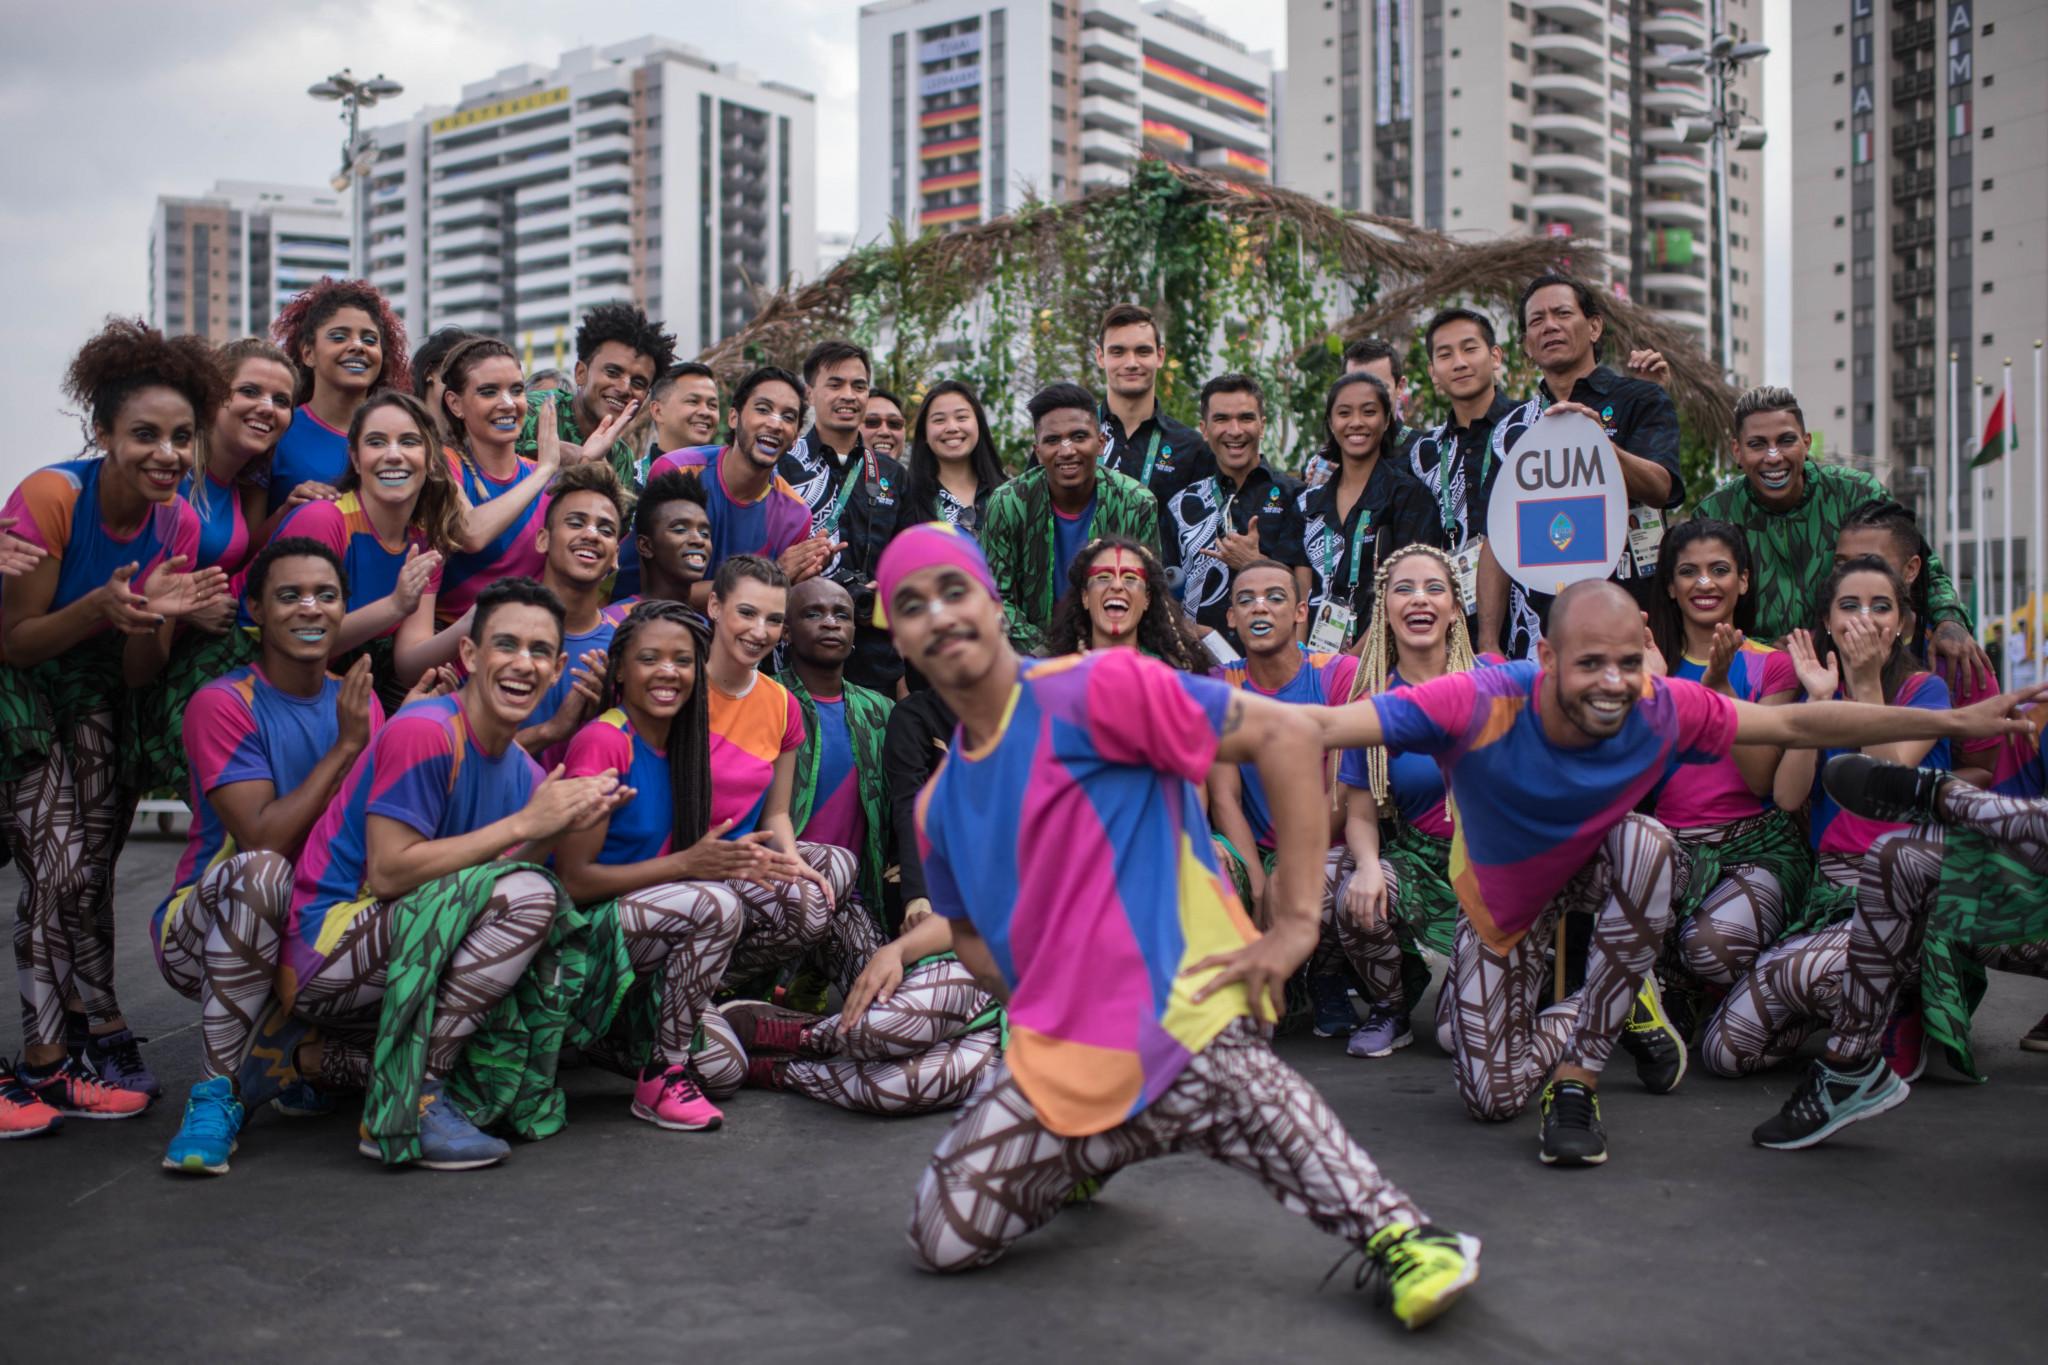 Guam hopeful of increased representation at Tokyo 2020